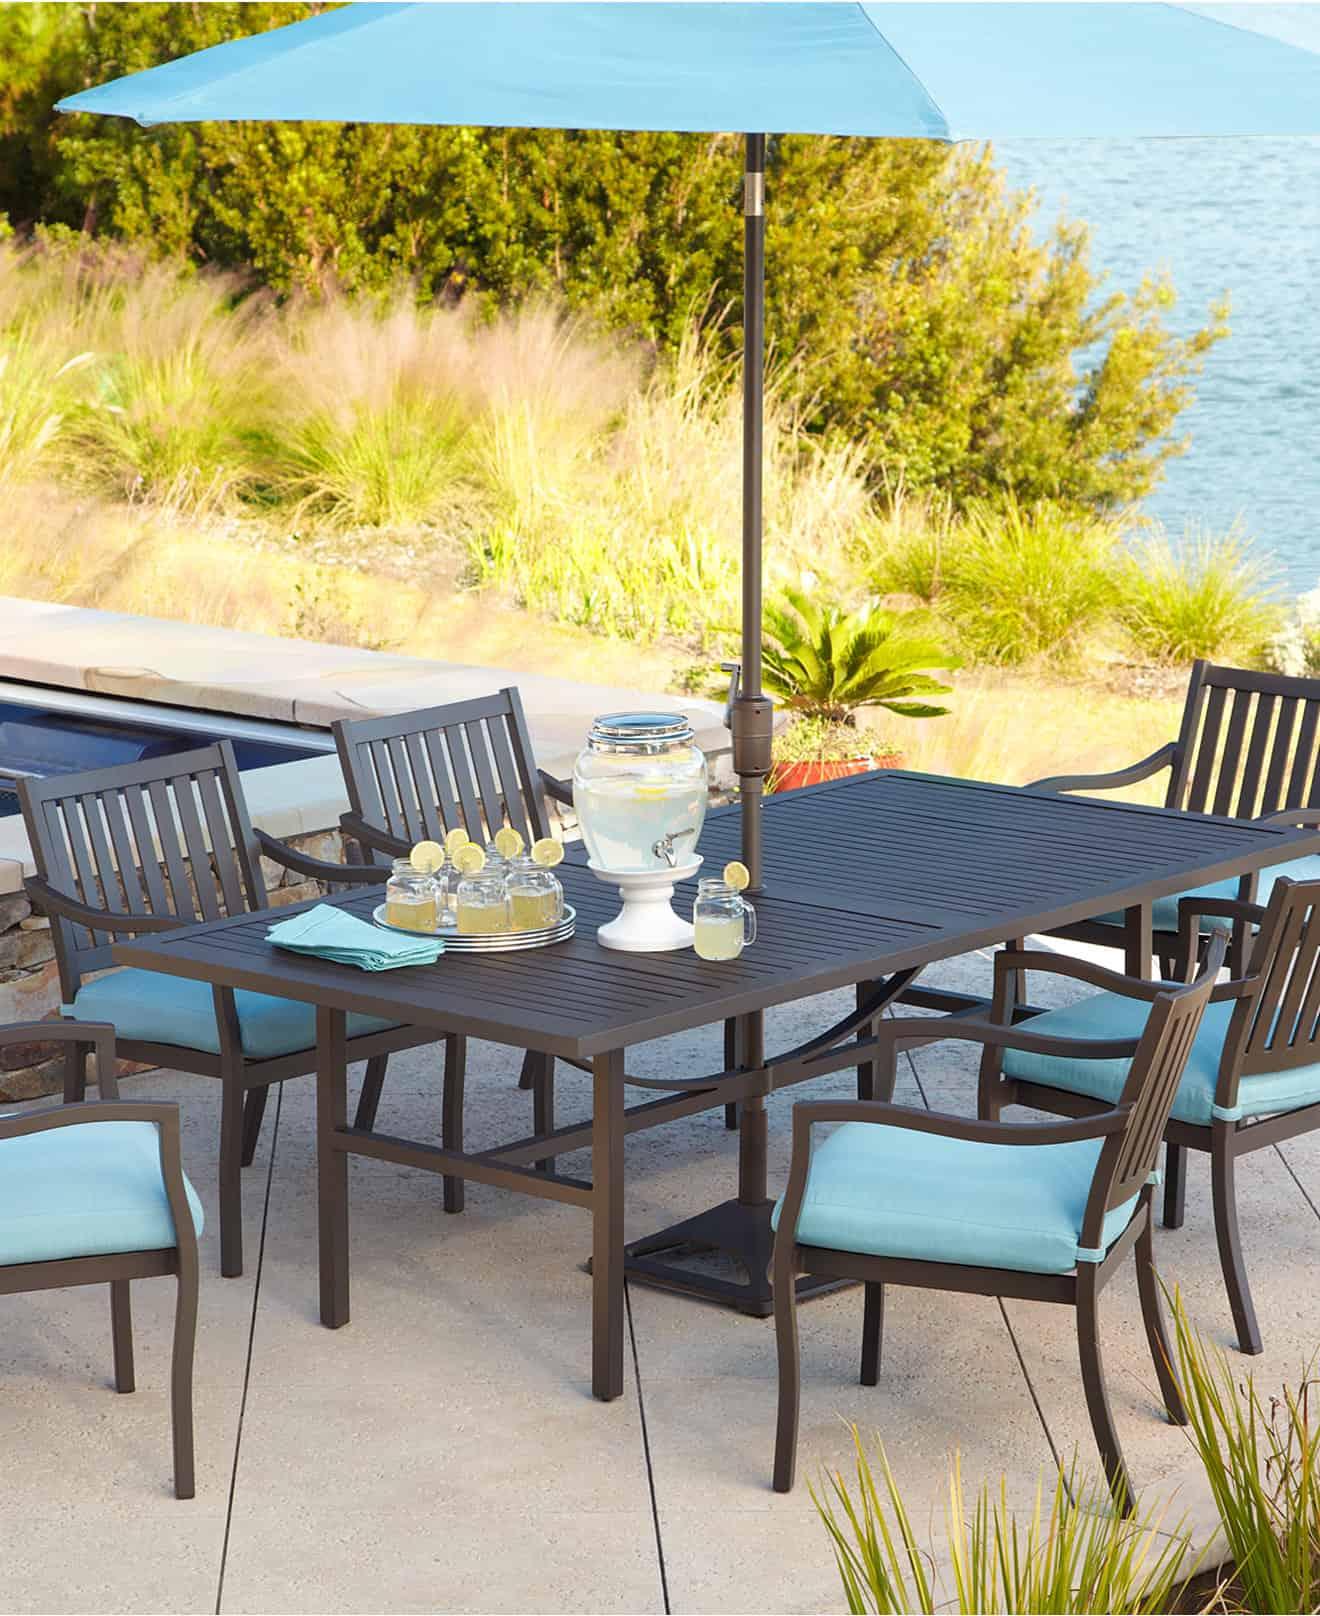 Take the beautiful blue hue outdoors as well.